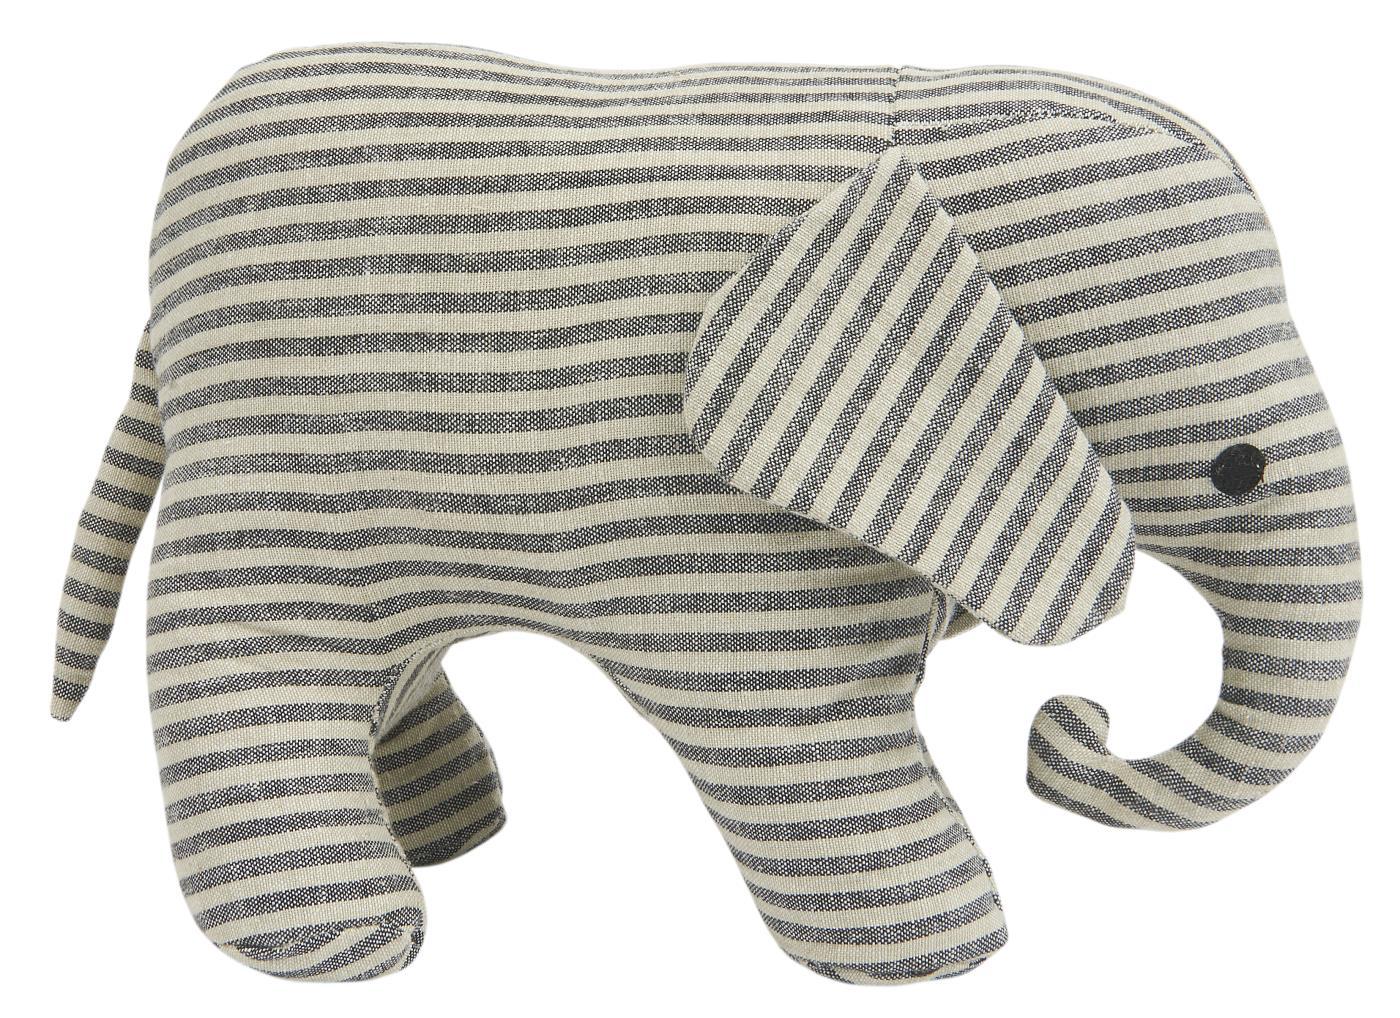 Dörrstopp Elefant - Ib Laursen